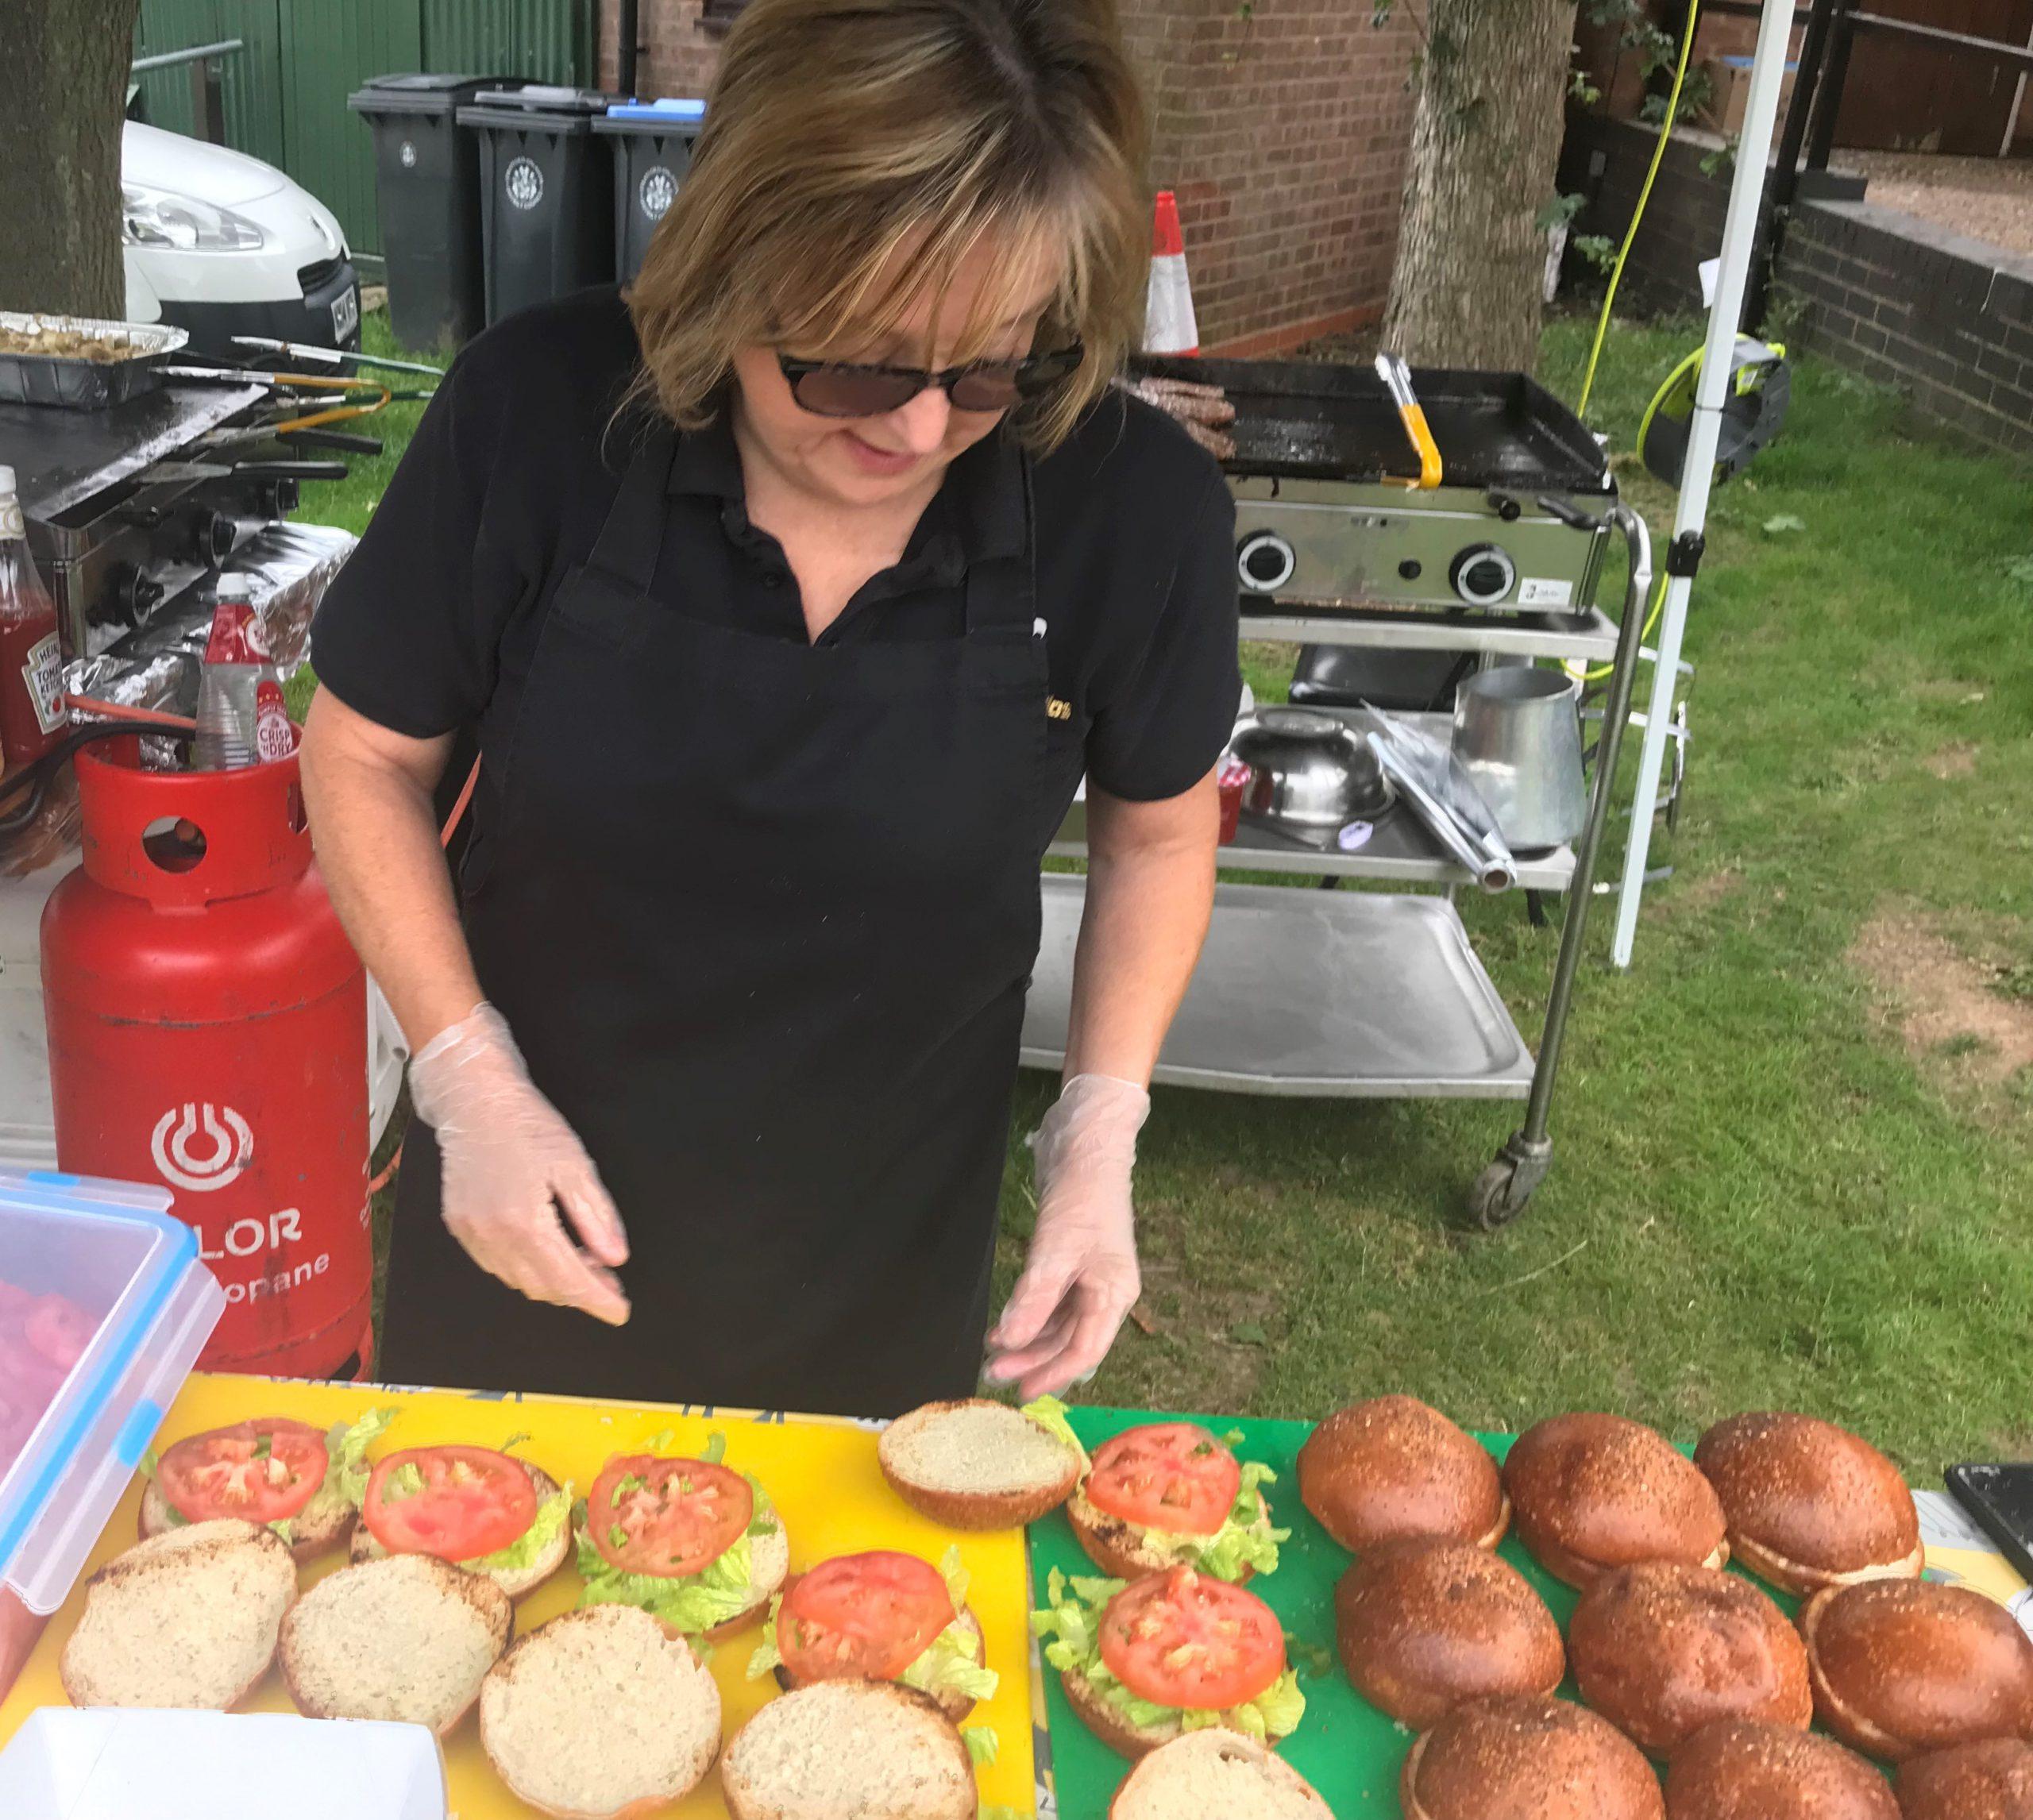 Gourmet Gorillas preparing at Wixford